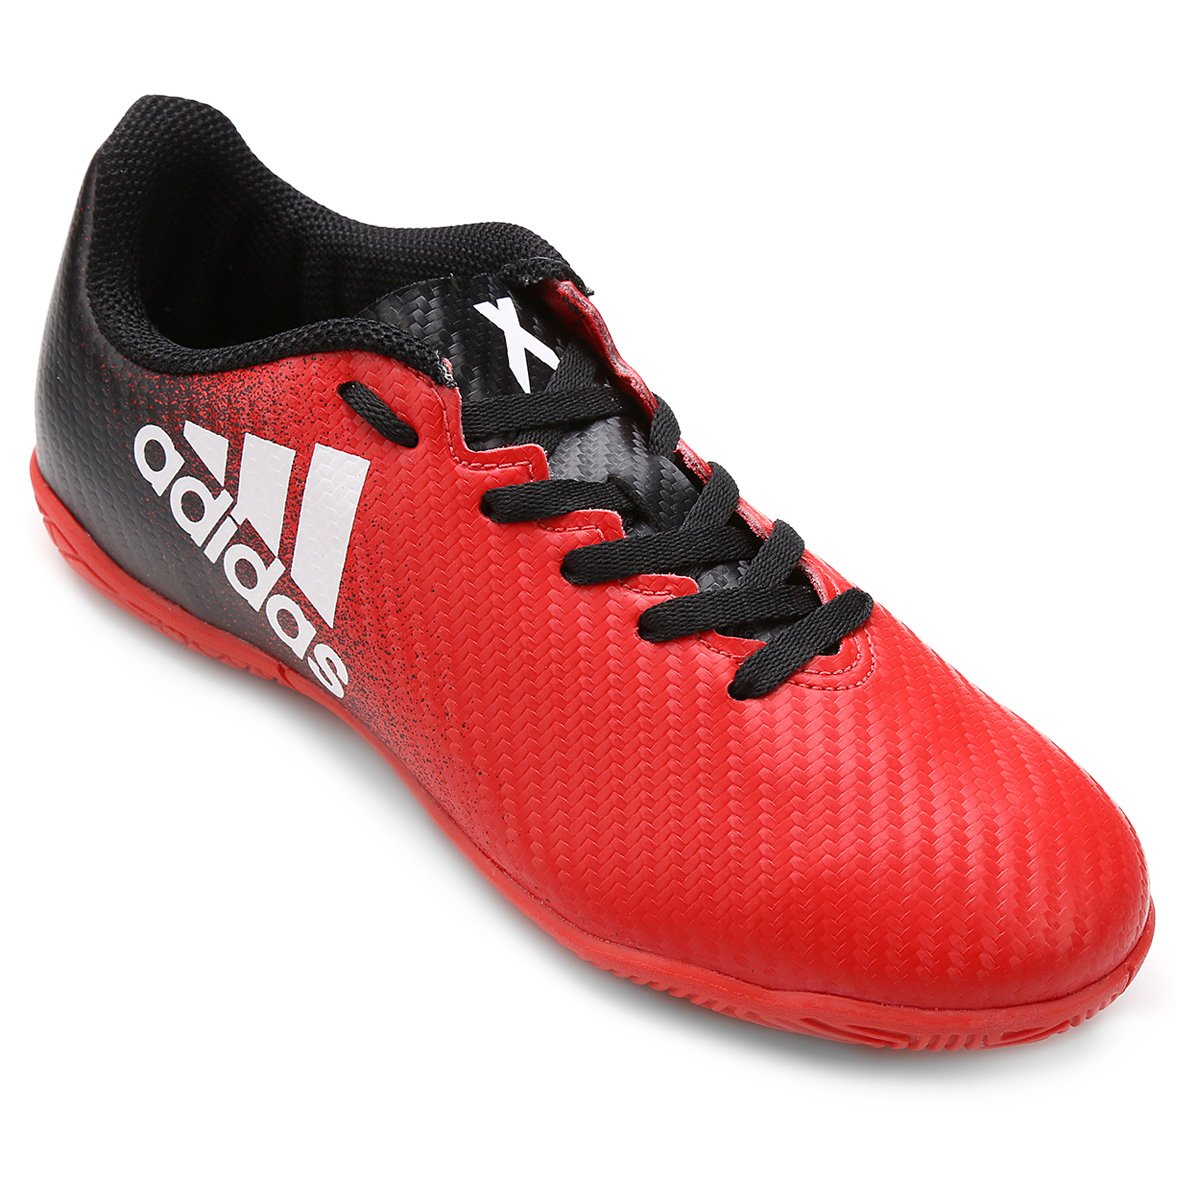 2313357ccd ... Chuteira Futsal Juvenil Adidas X 16 4 IN ... sale retailer 6f667 c8e94  ...